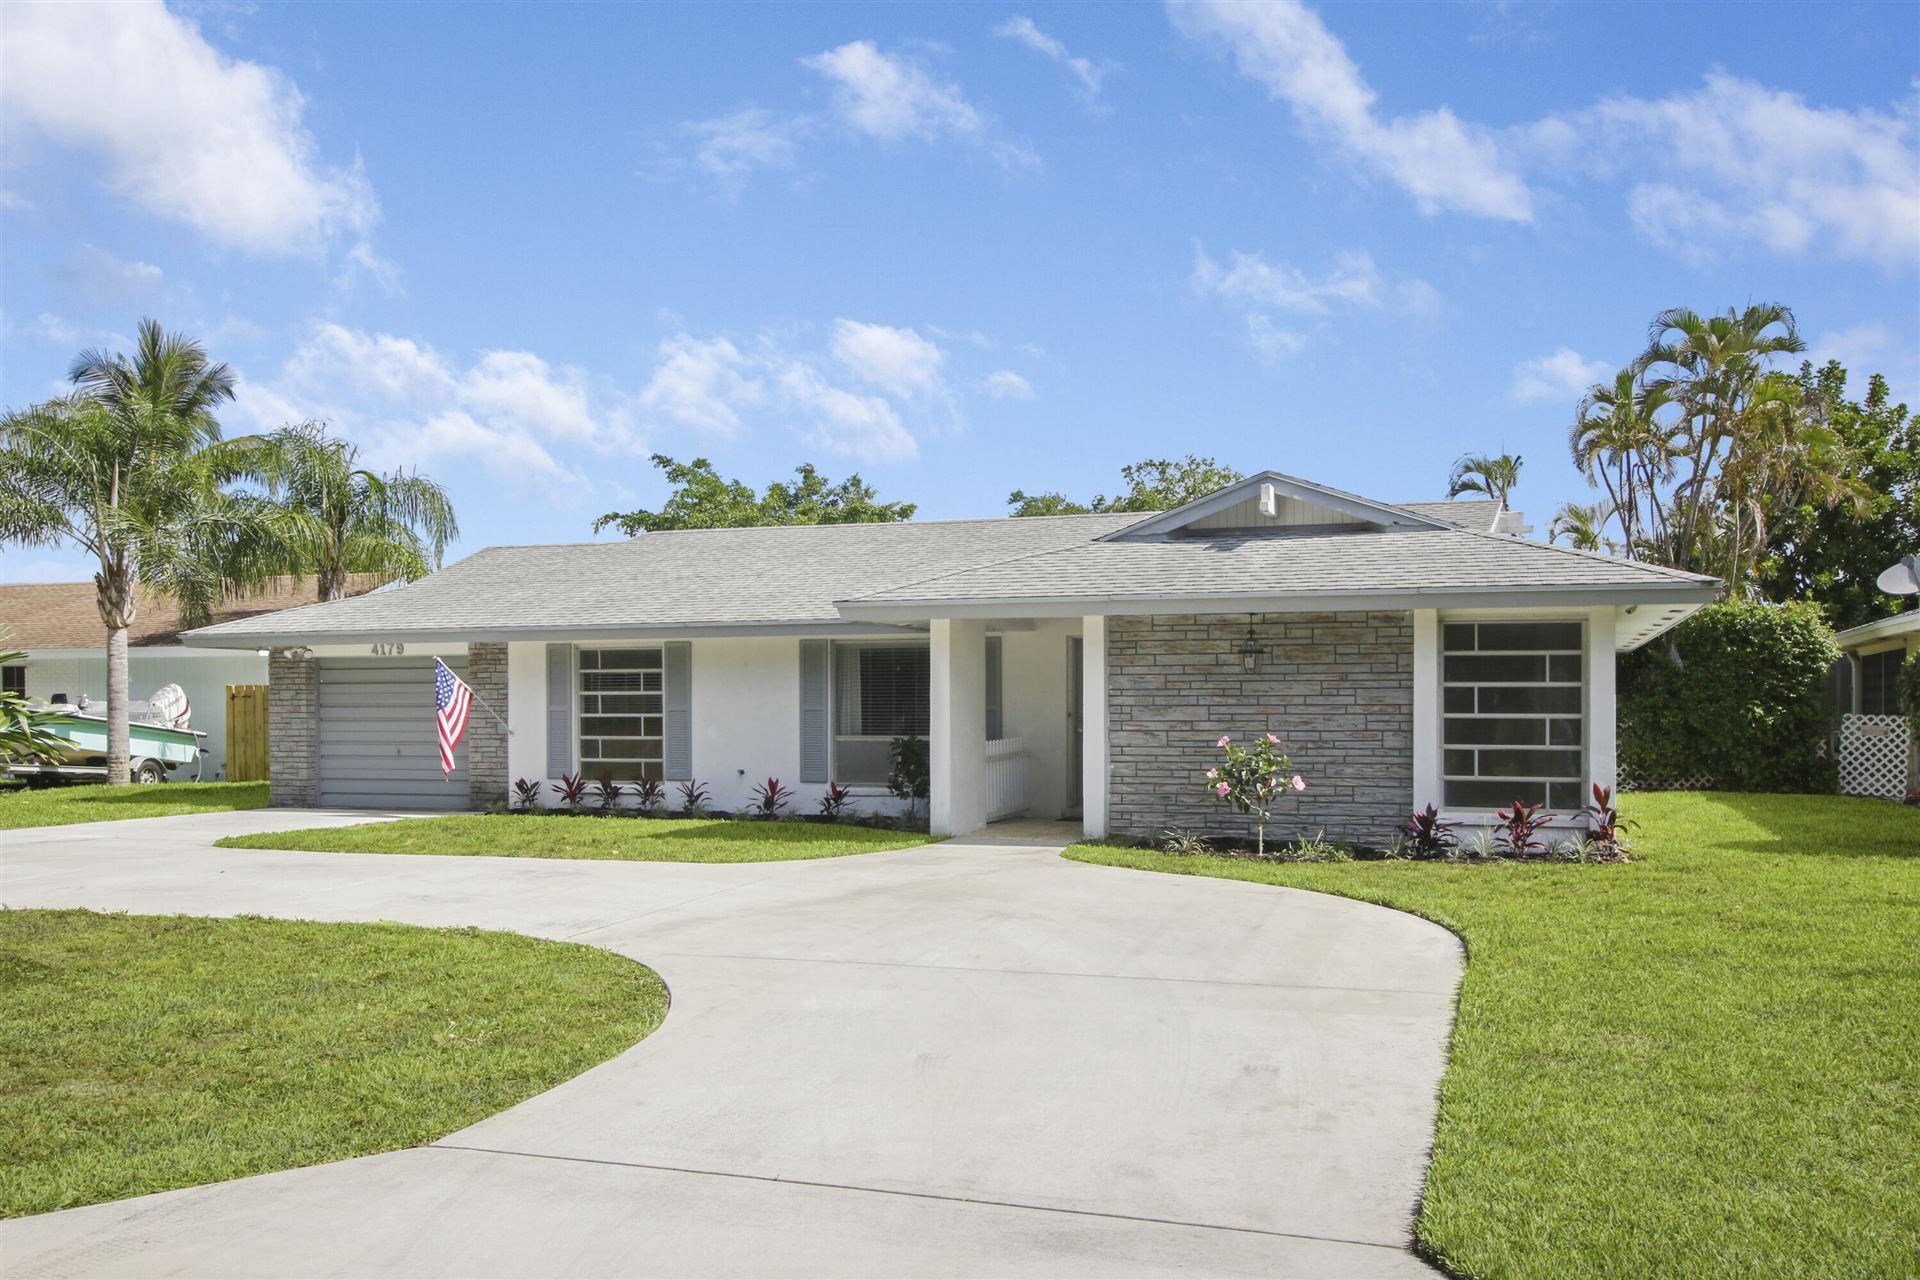 Photo of 4179 Hyacinth Circle N, Palm Beach Gardens, FL 33410 (MLS # RX-10716120)